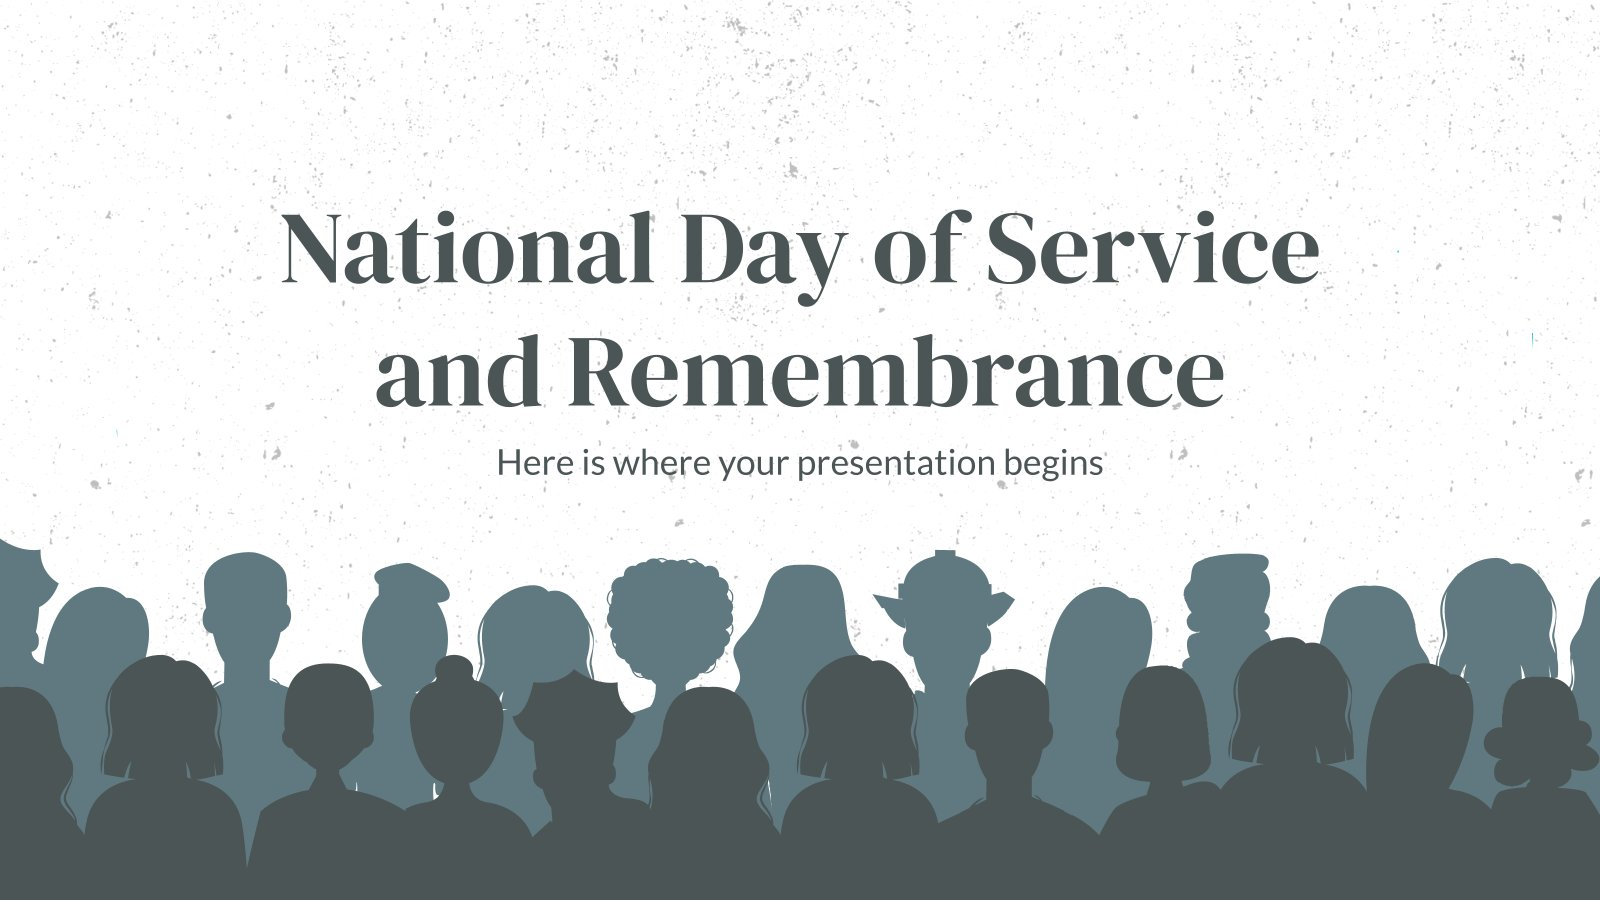 National Day of Service and Remembrance Präsentationsvorlage